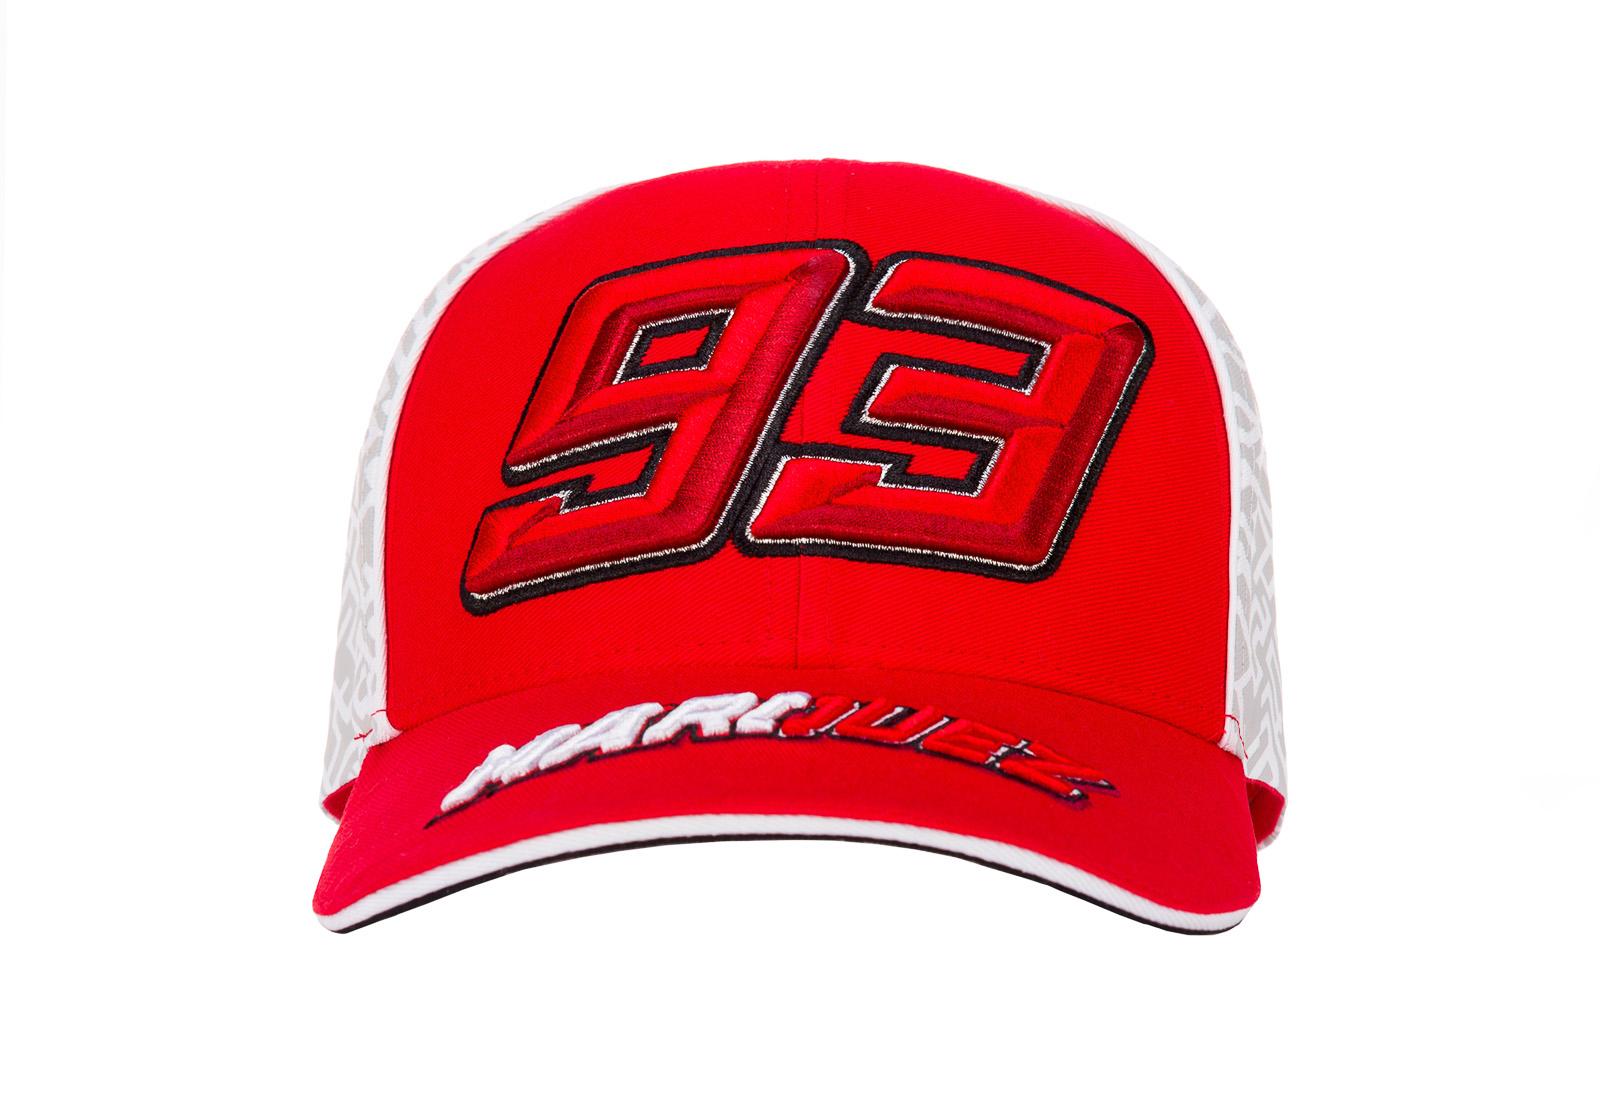 Sentinel 2018 Marc Marquez  93 MotoGP Adult Baseball Cap Red White Official  Merchandise 61f17b81a477